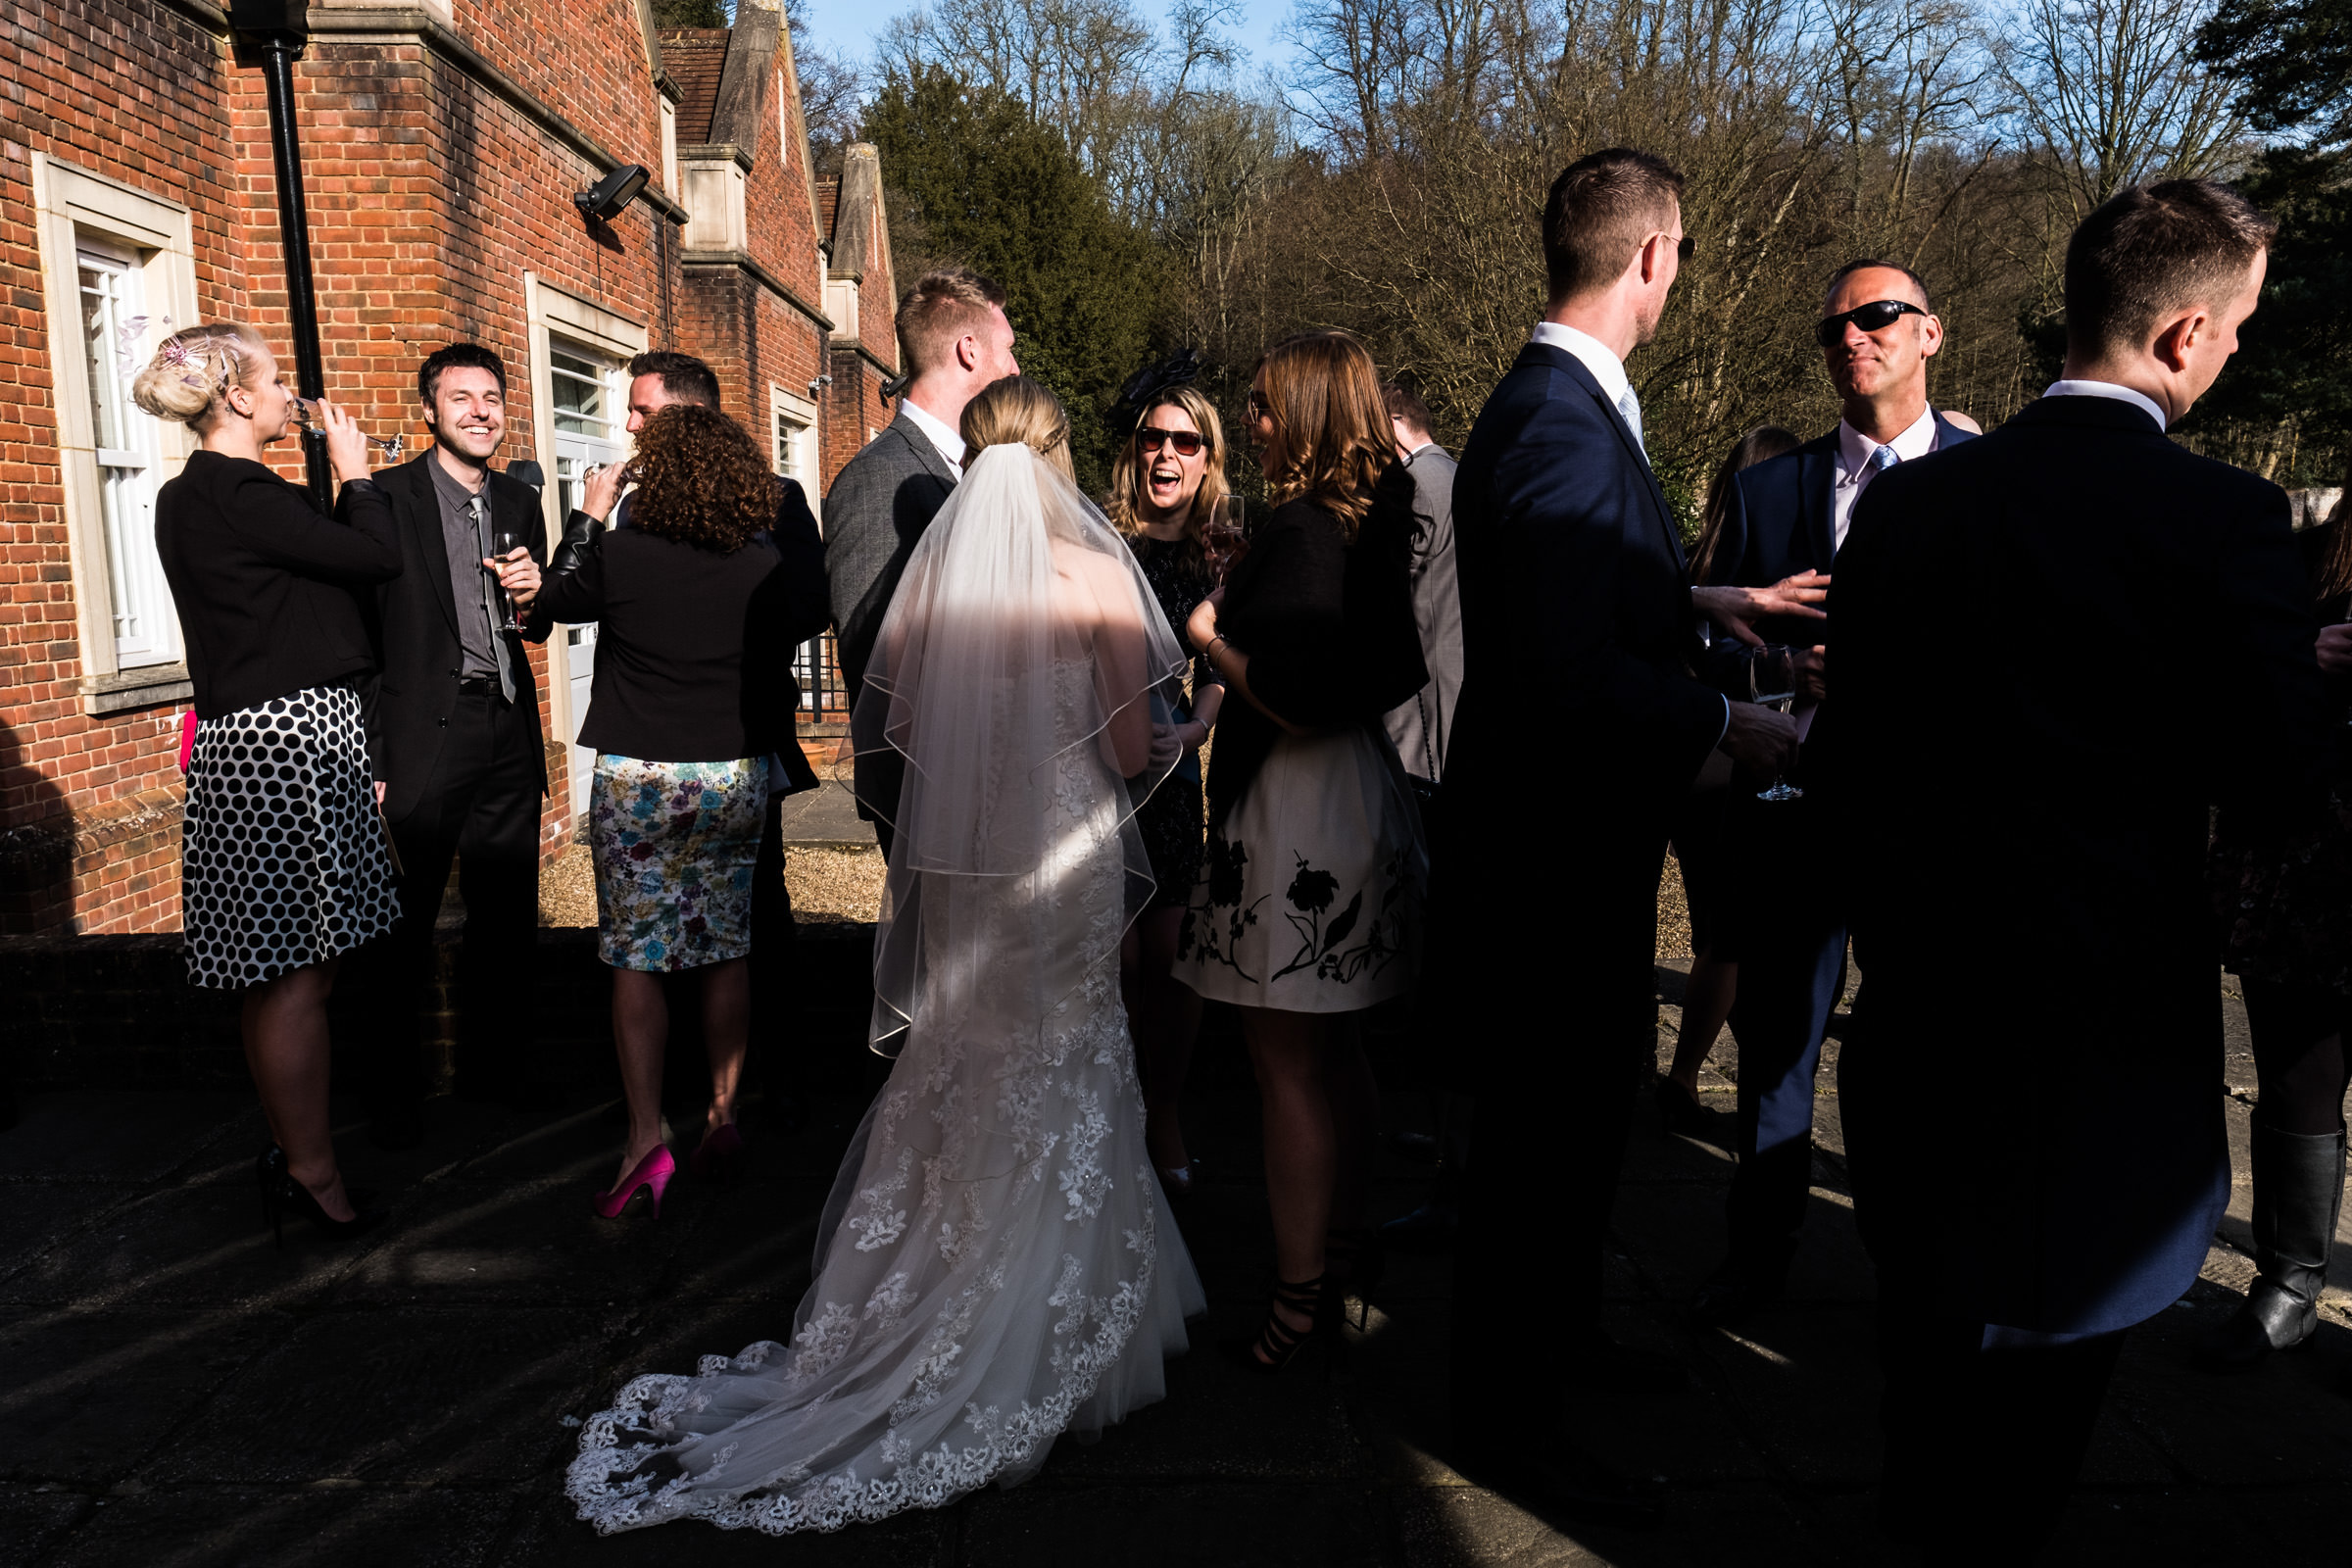 Donna+&+Nick's+Wedding+at+Wotton+House+in+Dorking+016.jpg